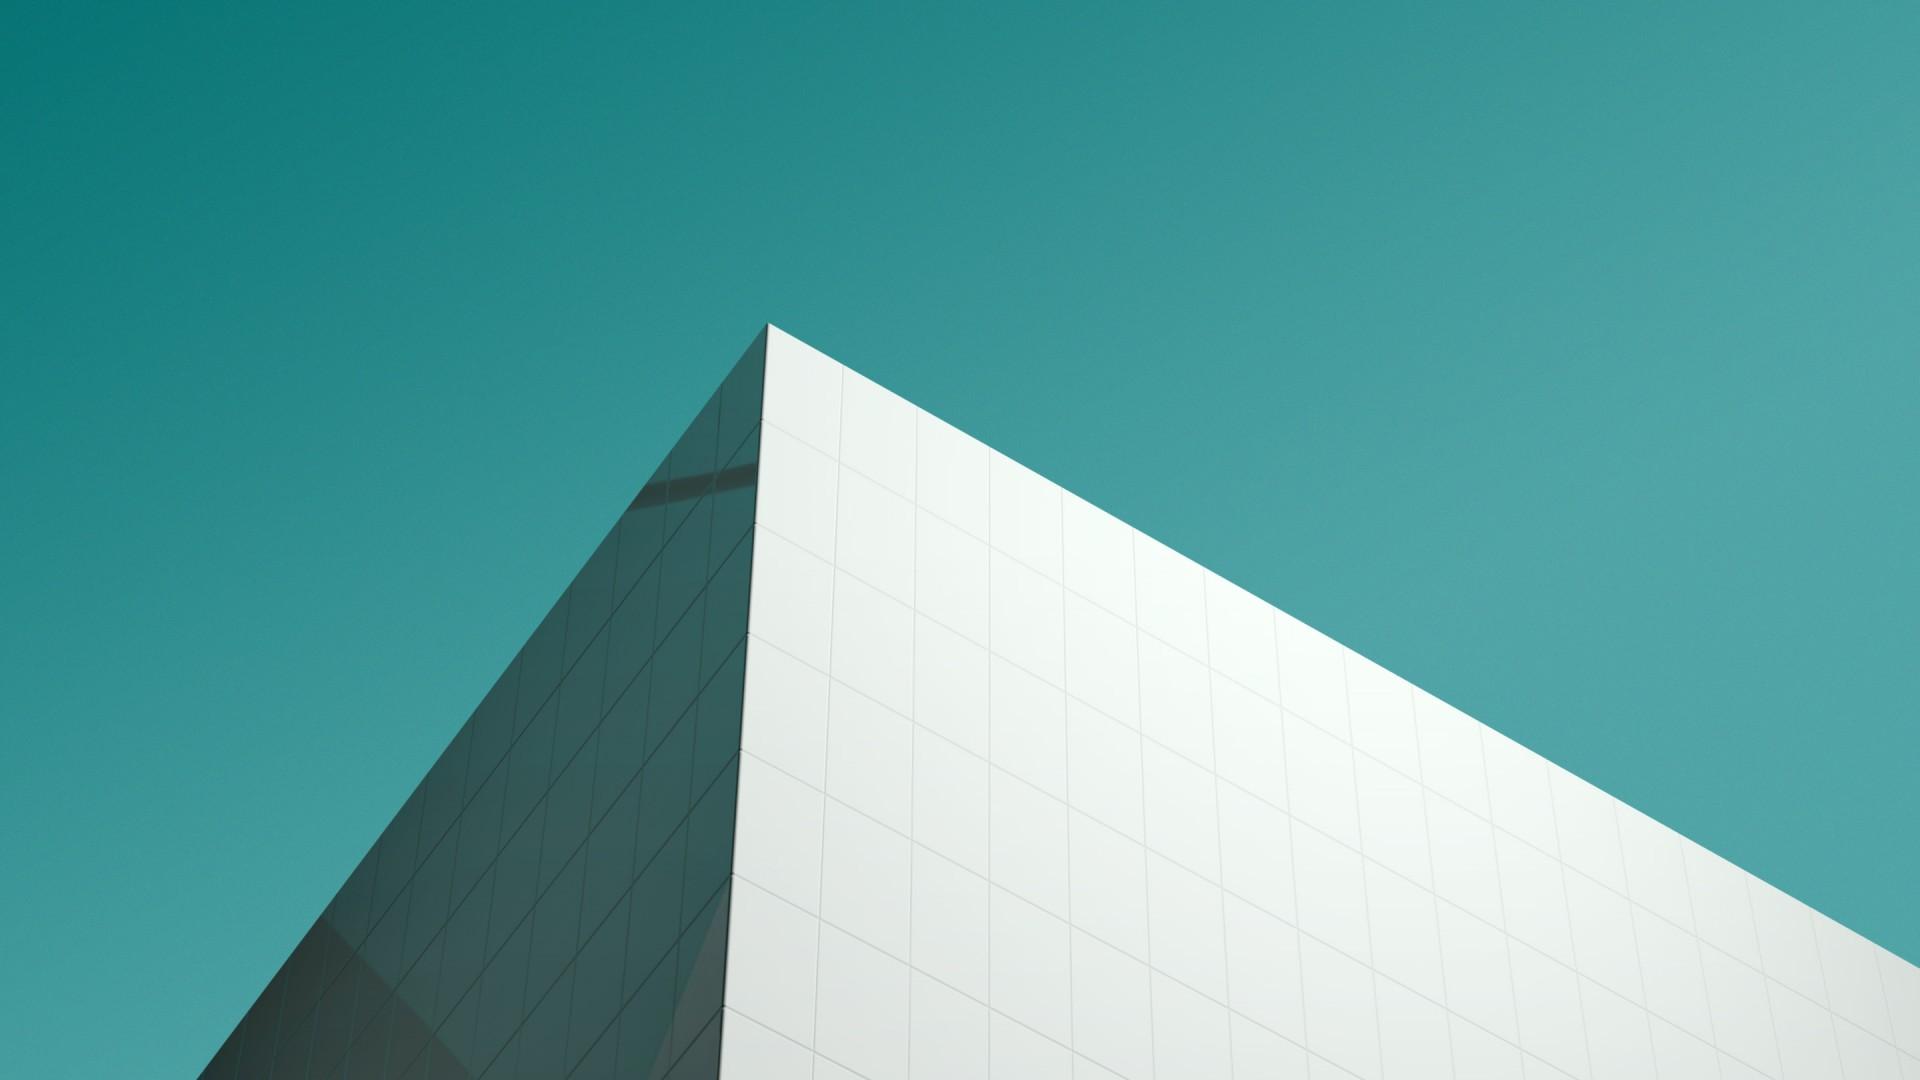 Minimal Architecture Wallpaper Hd   12x12   Download HD ...